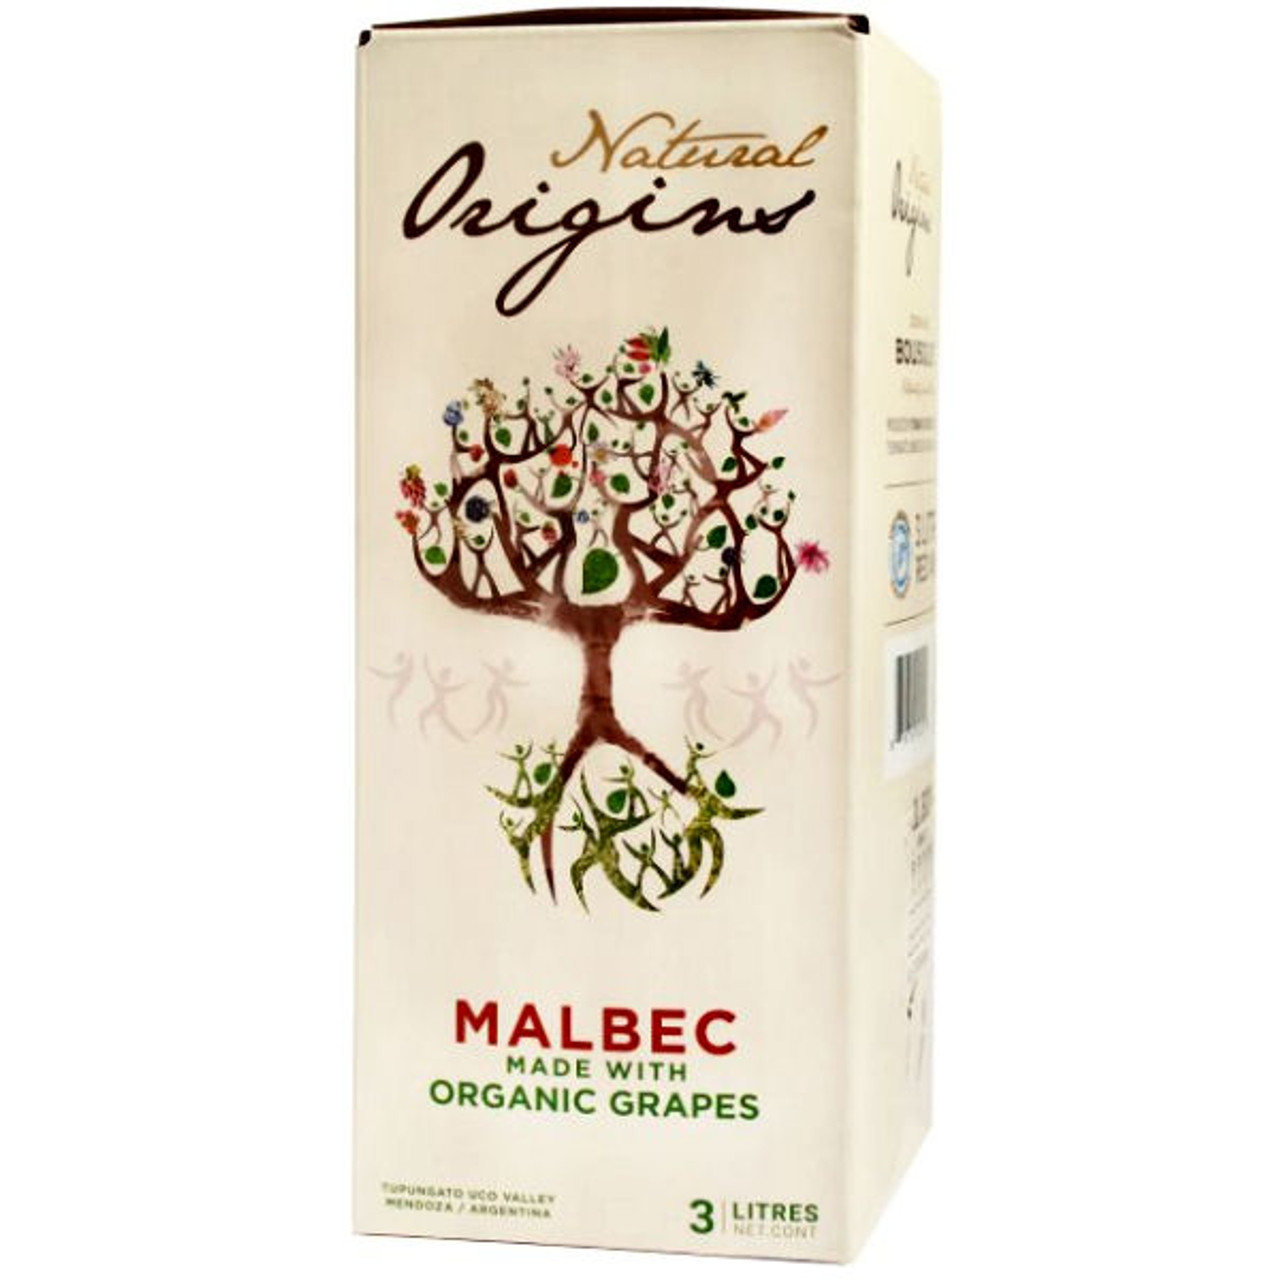 Domaine Bousquet Natural Origins Organic Malbec Bag-In-Box